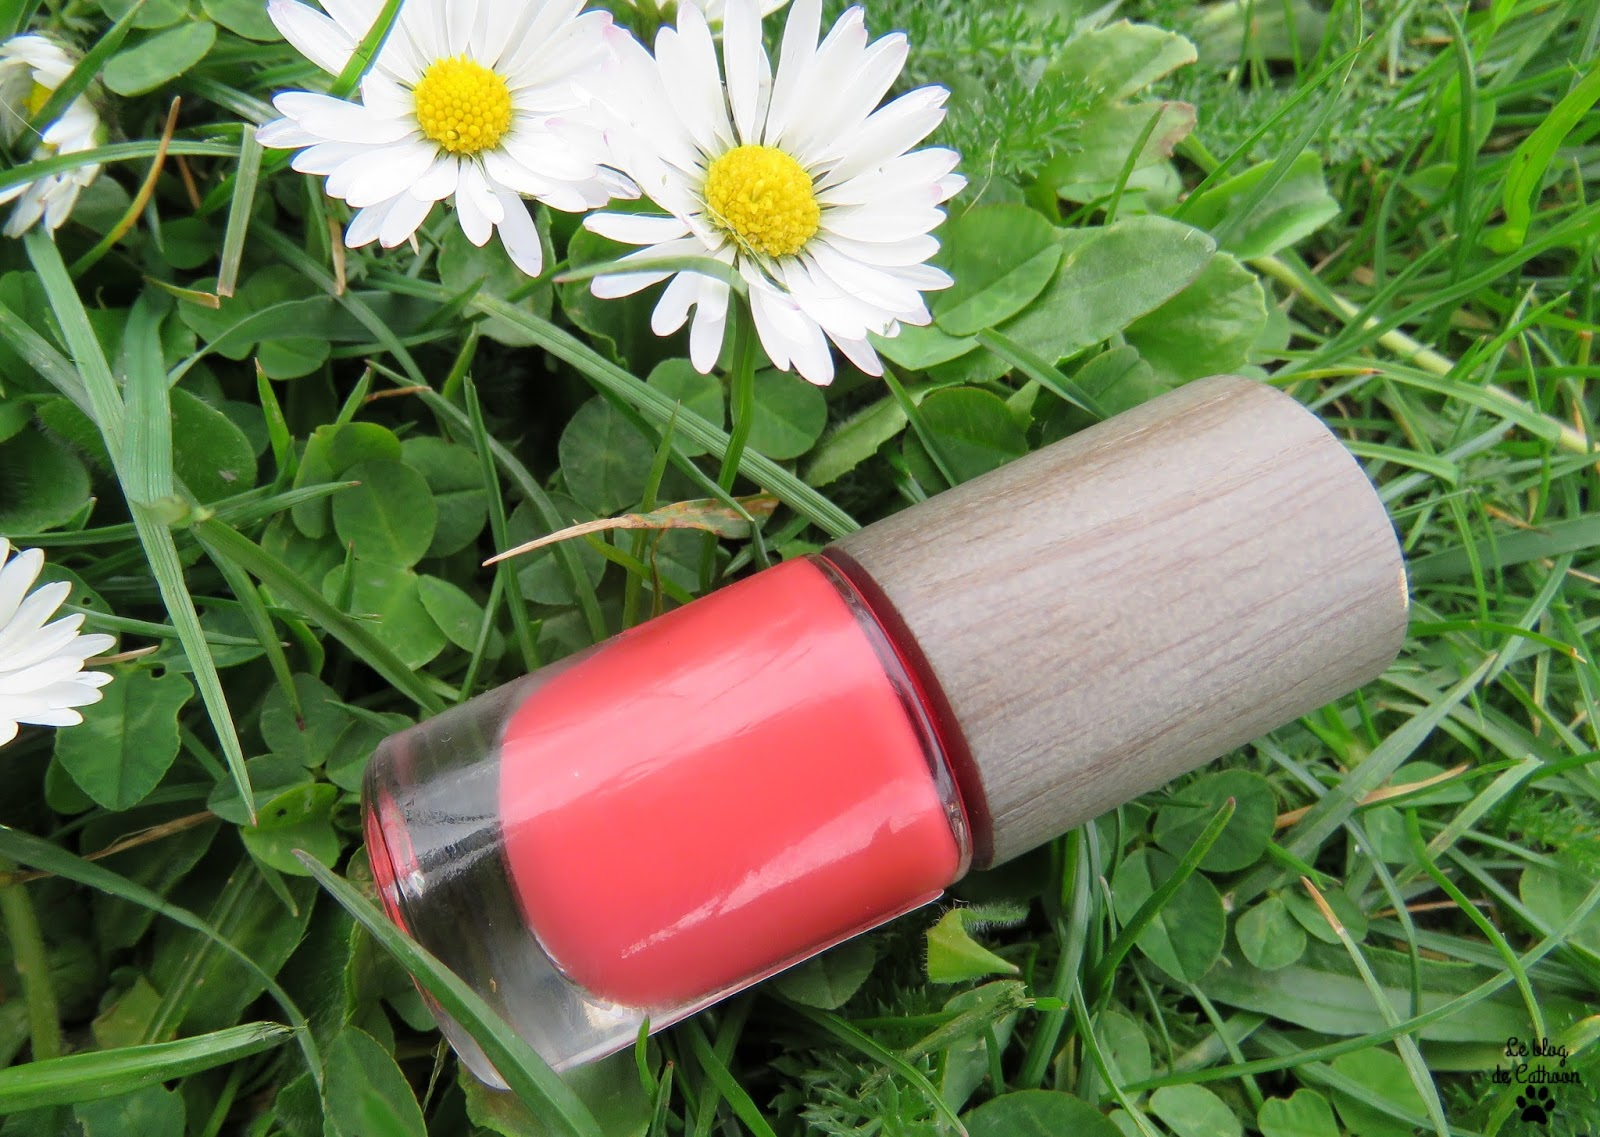 07 Corail - Vernis à Ongles - Bo-ho Cosmetics